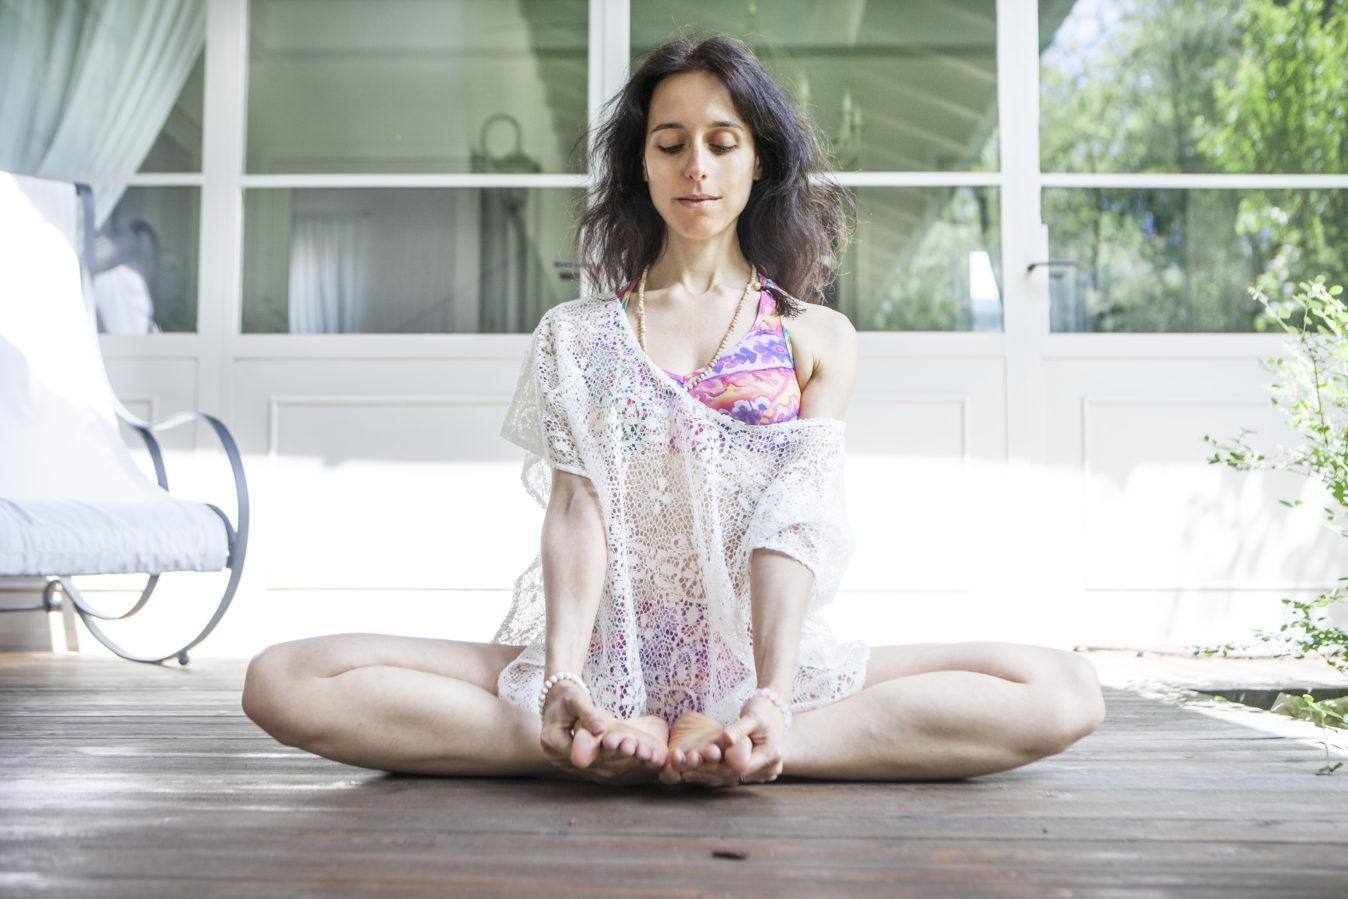 Yoga benedetta spada